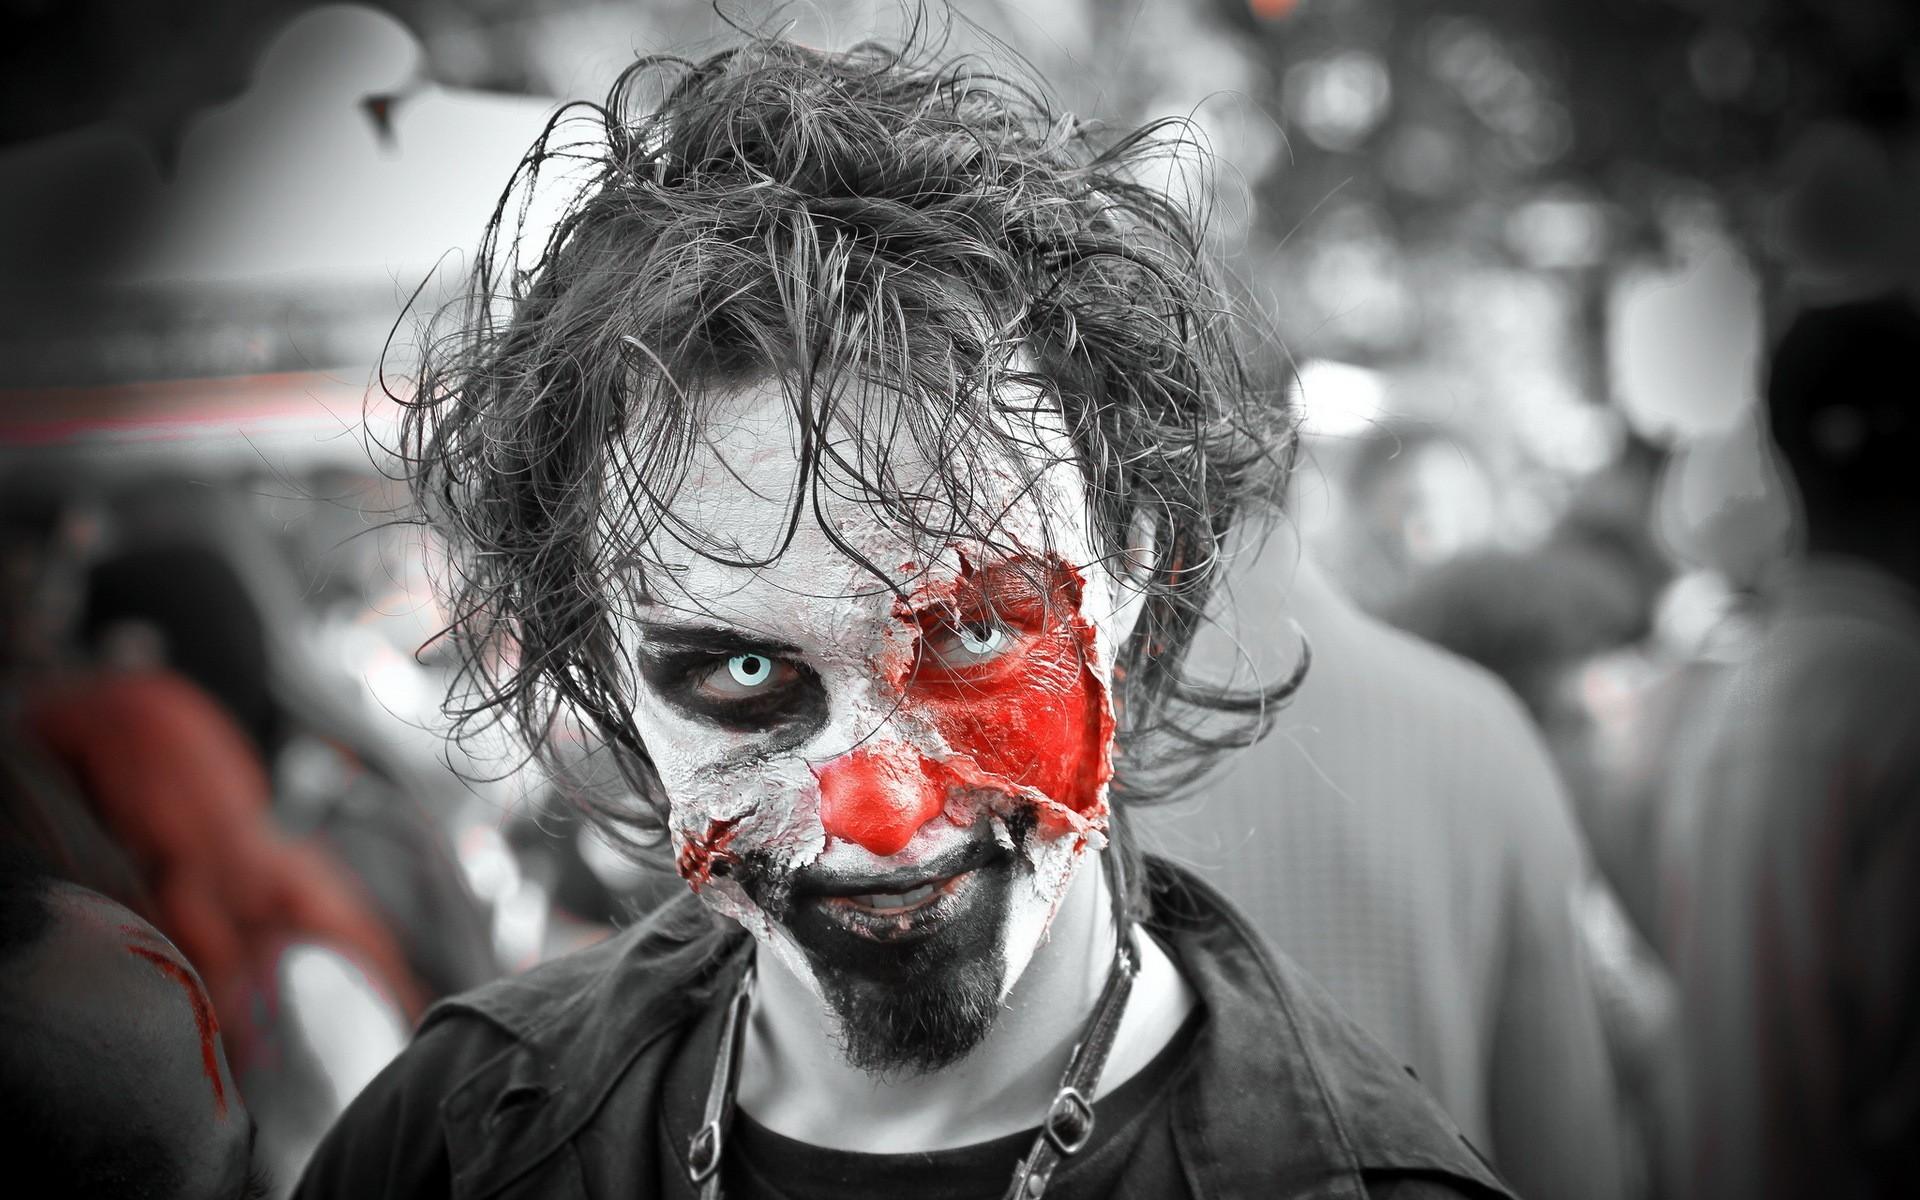 Res: 1920x1200, Zombie Clown Wallpaper